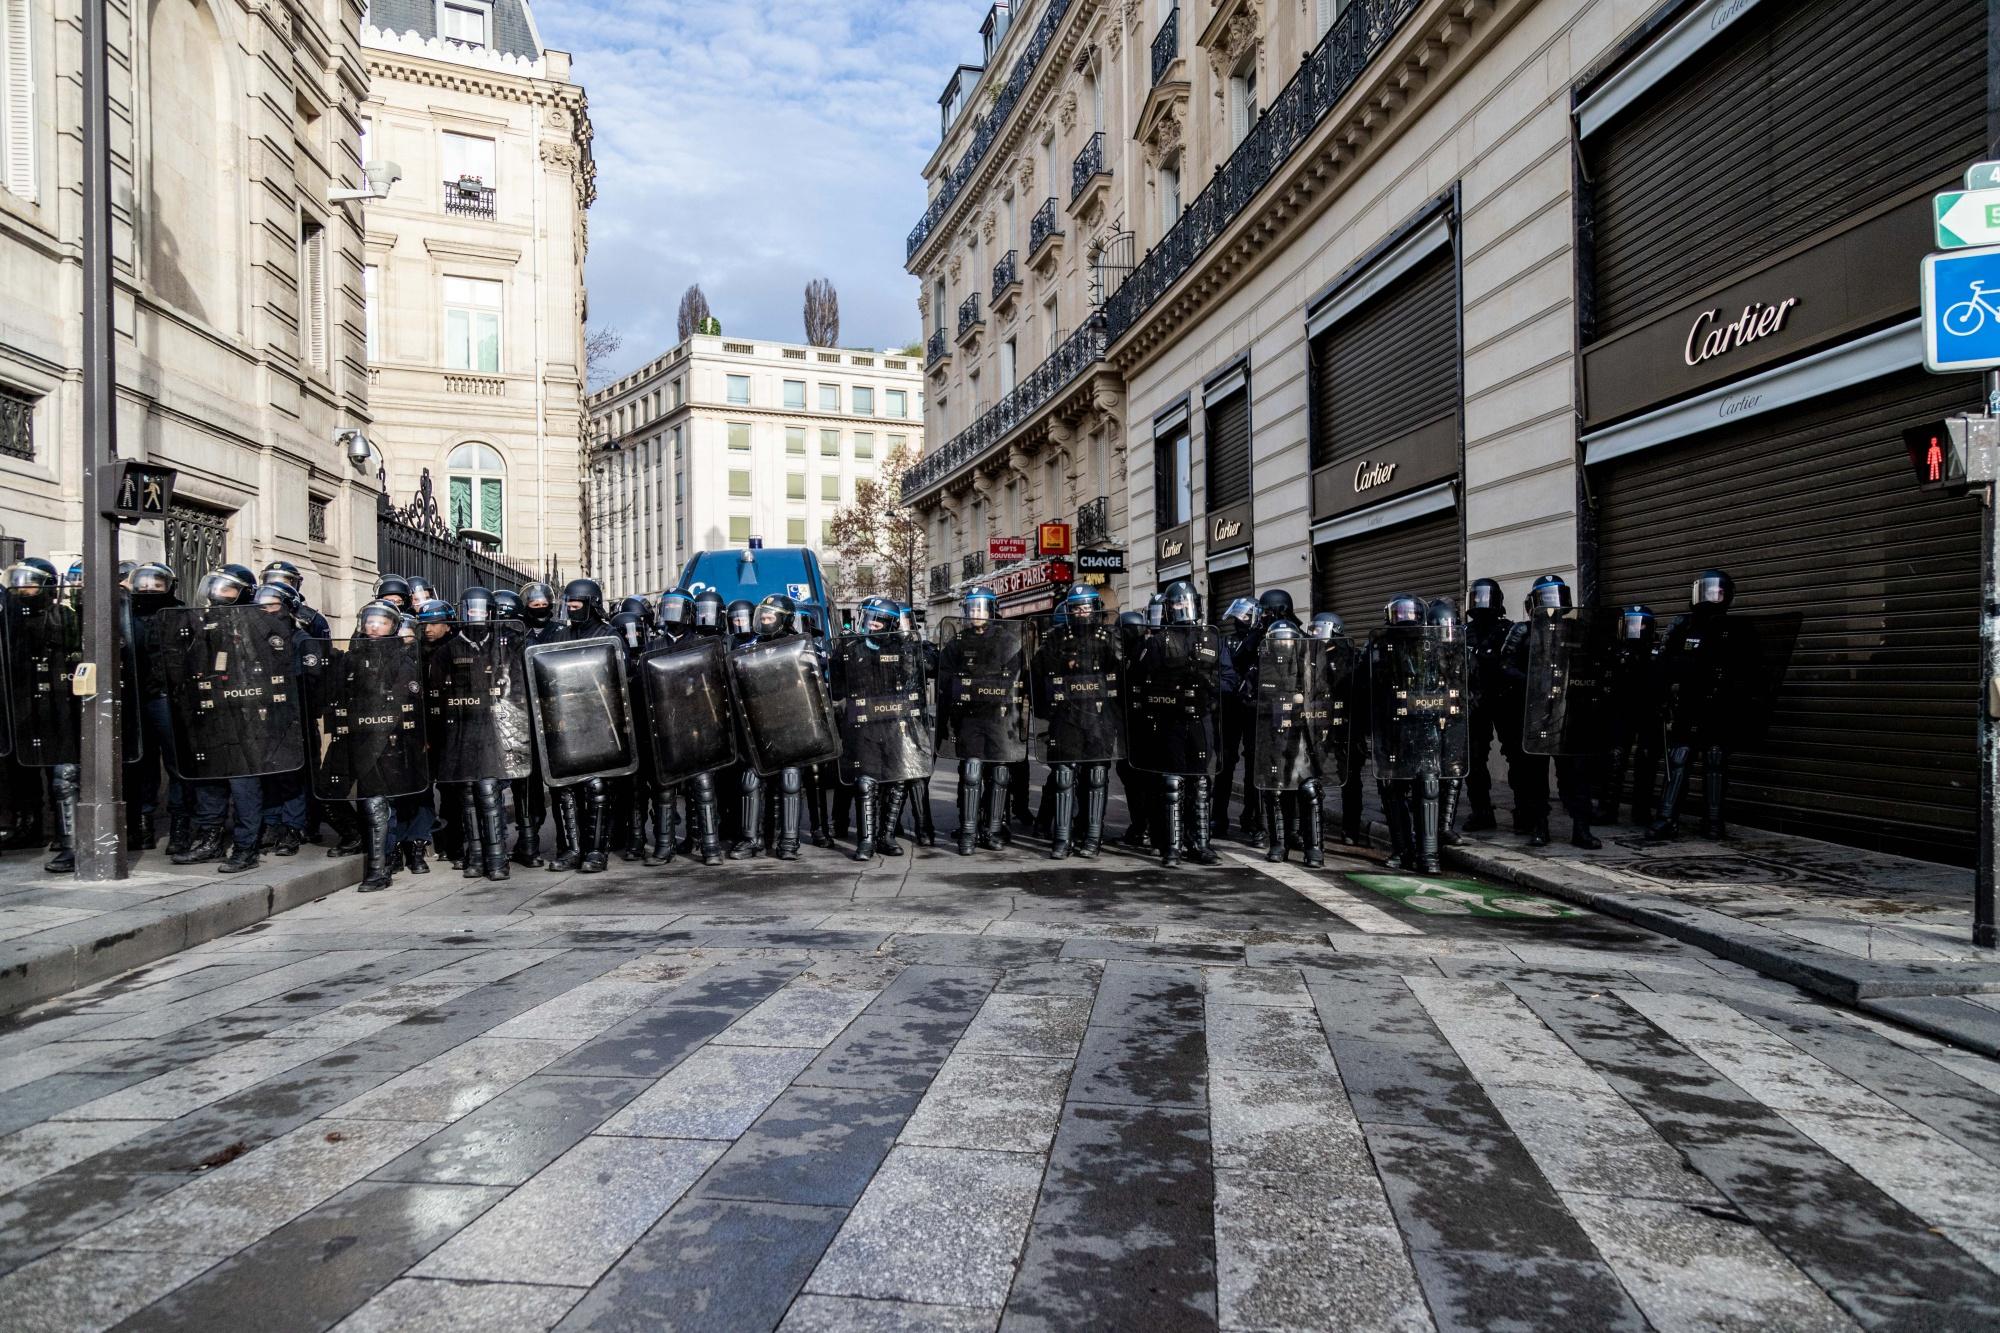 Police form a blockade near a shuttered Cartier store in Paris